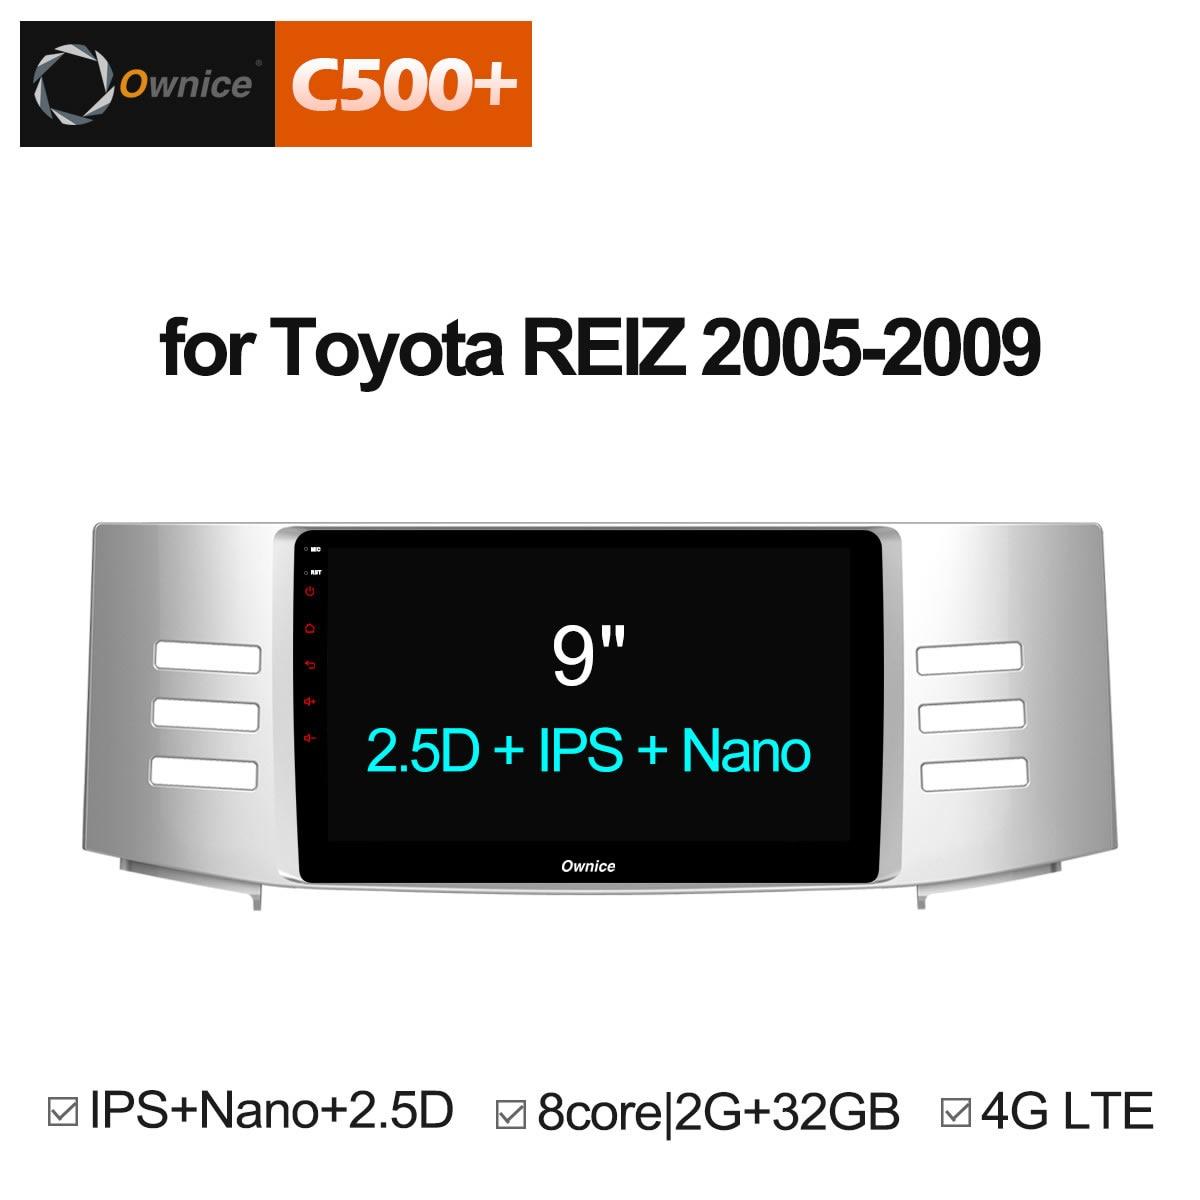 Ownice C500 + G10 voiture DVD GPS Android 8.1 Octa Core pour Toyota Reiz Mark X 2005 2006 2007 2008 2009 autoradio lecteur 4G LTE